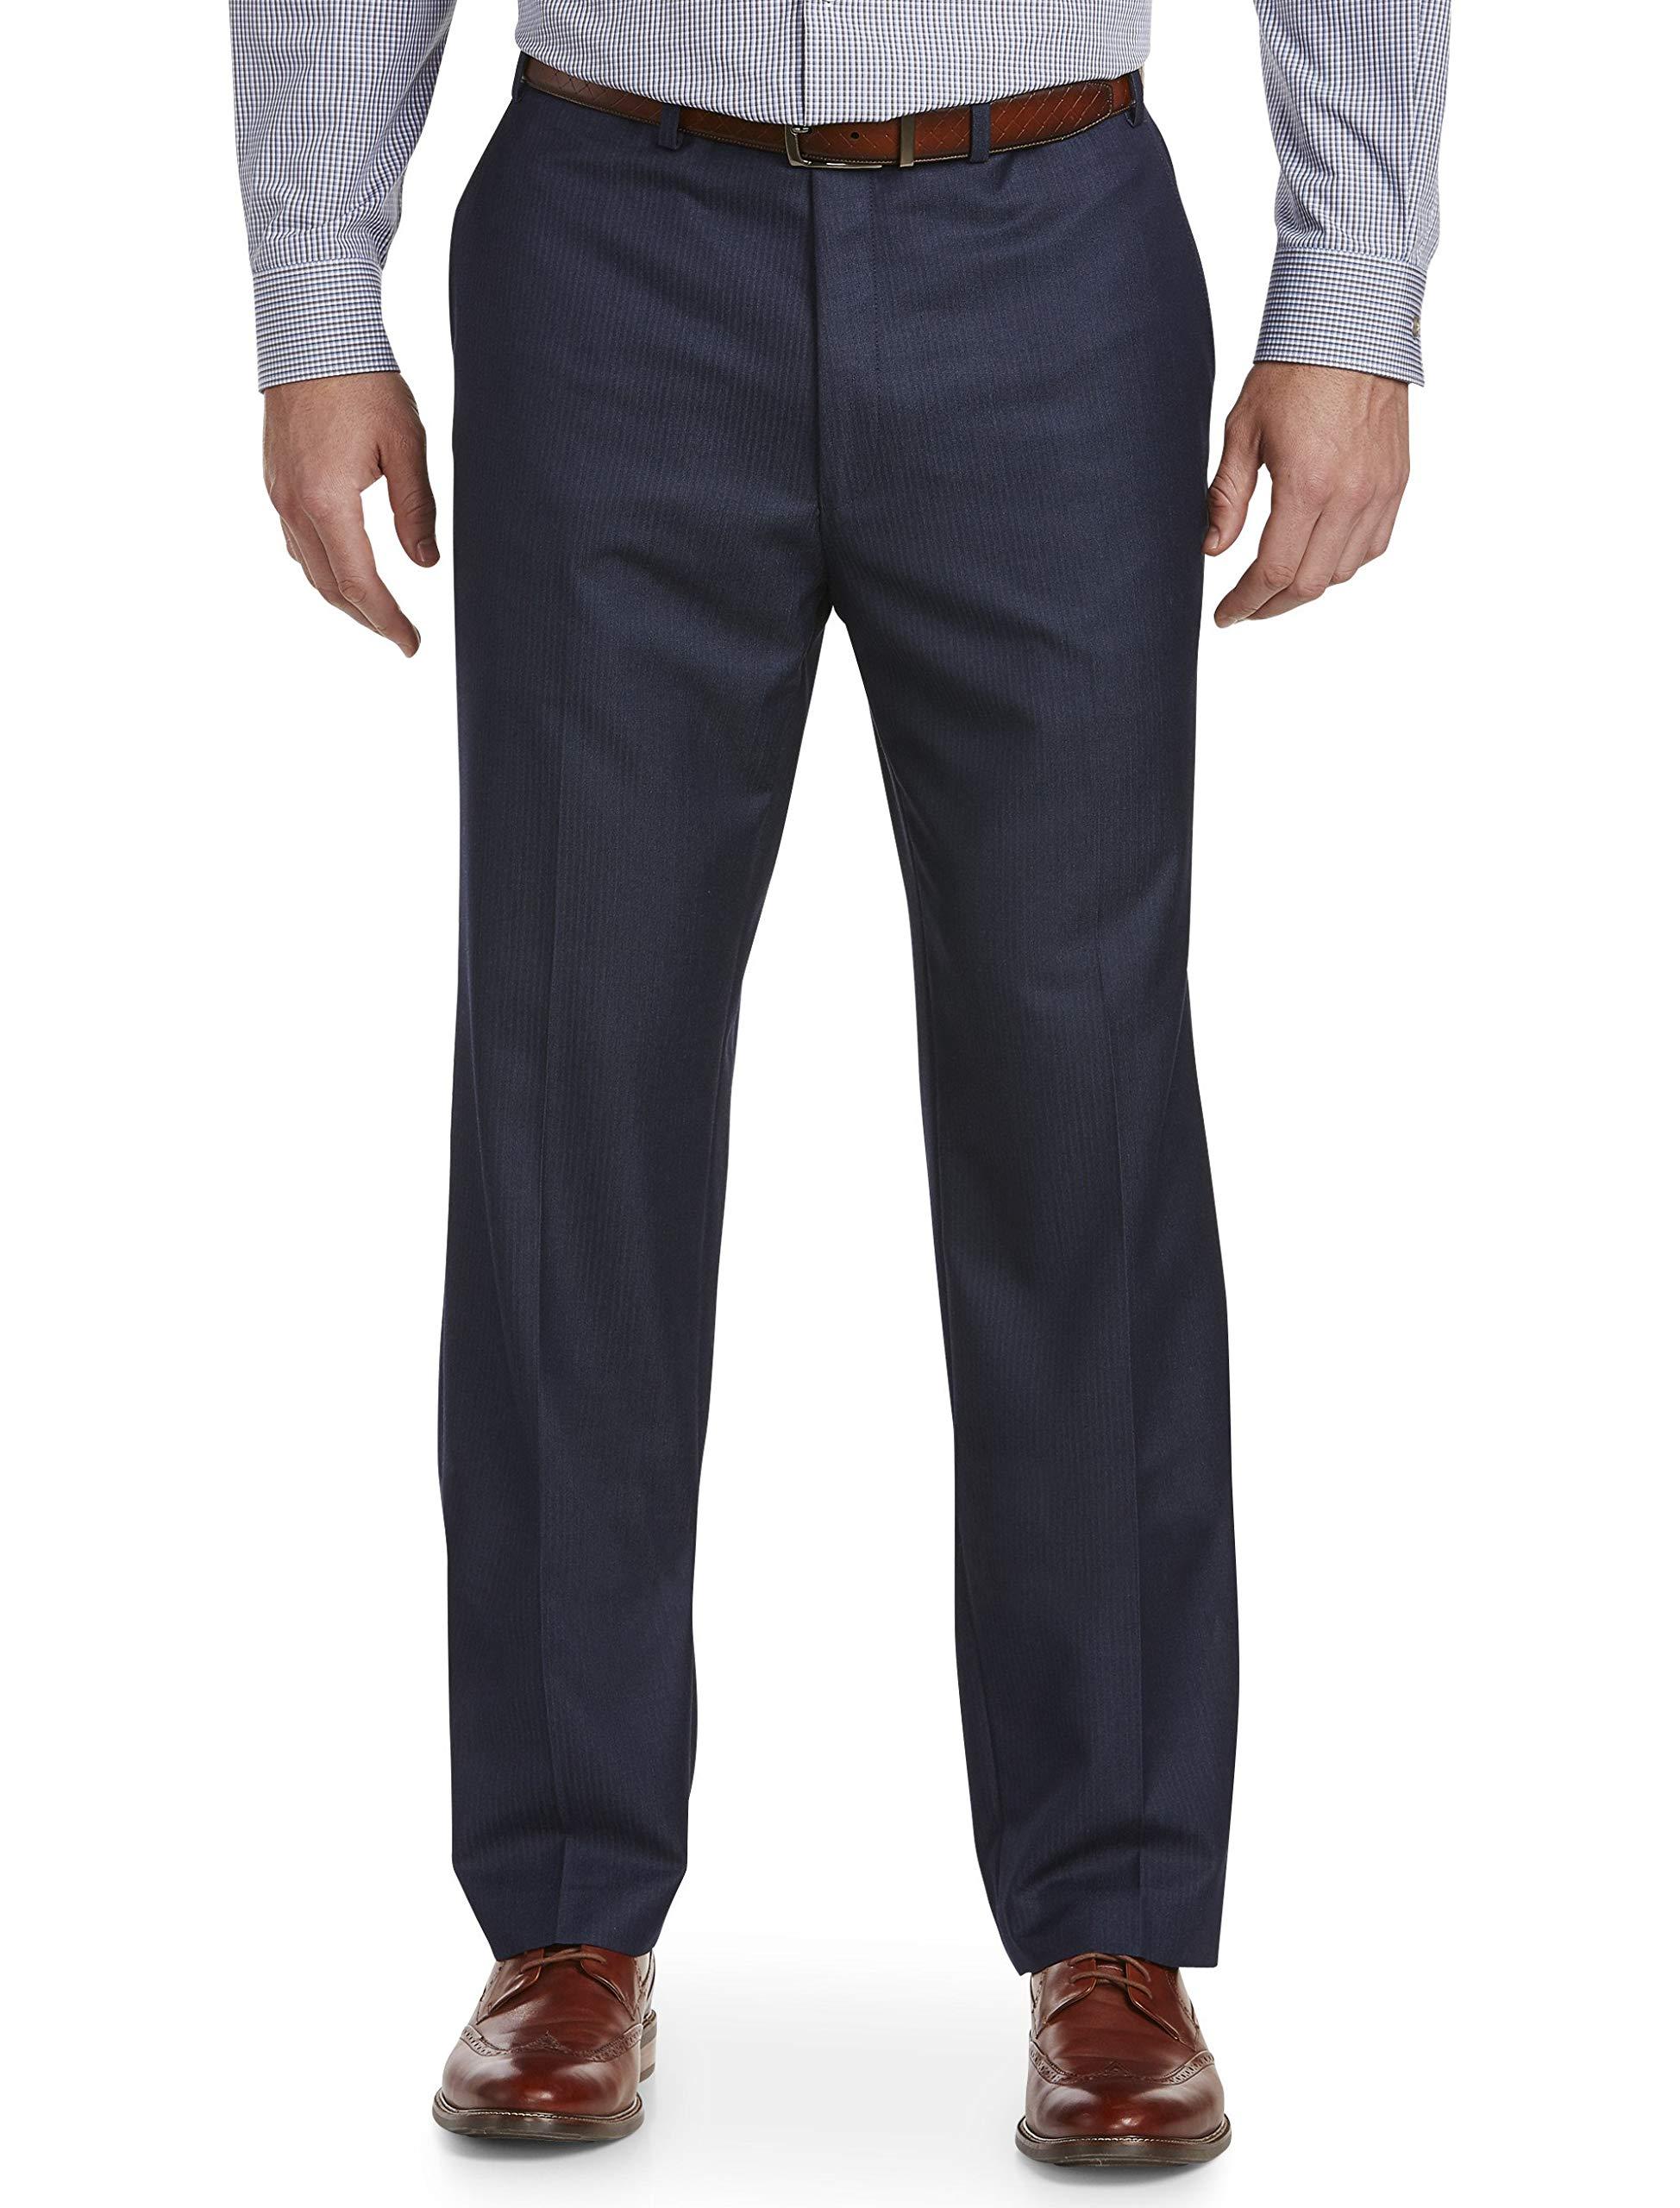 Michael Kors Herringbone Flat-Front Suit Pants Blue by Michael Kors